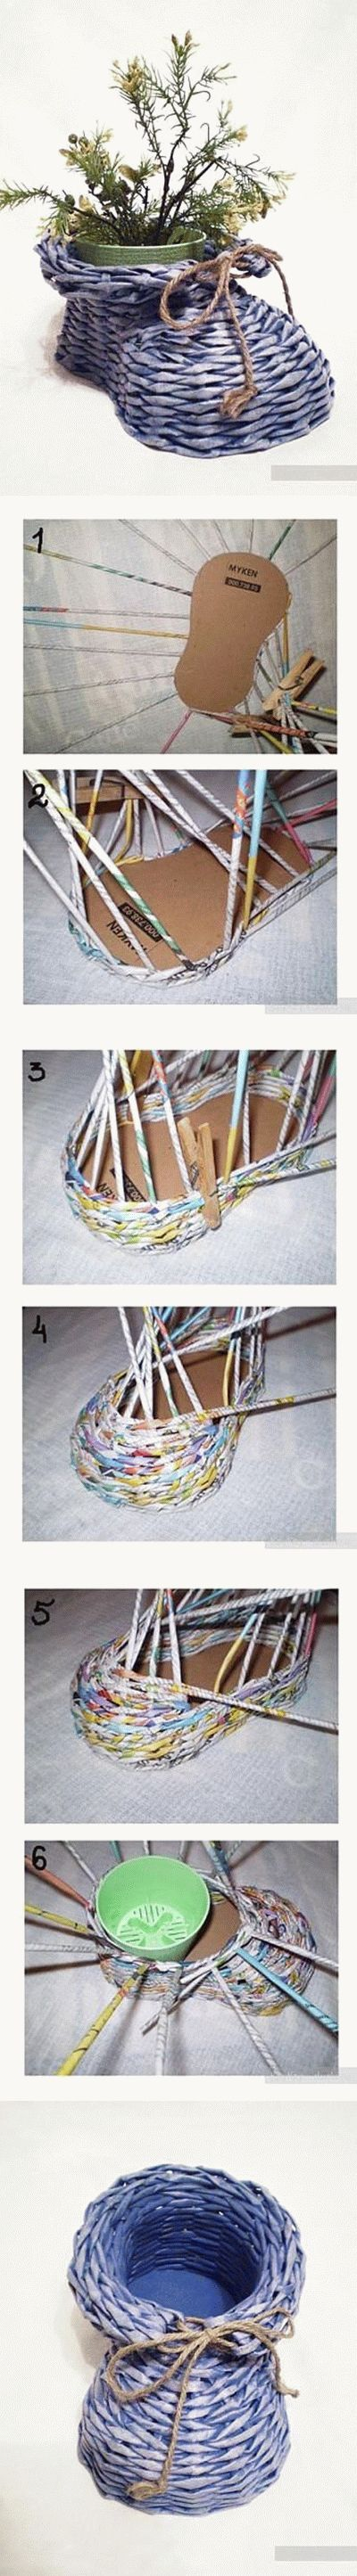 DIY Newpaper Roll Woven Shoe Vase